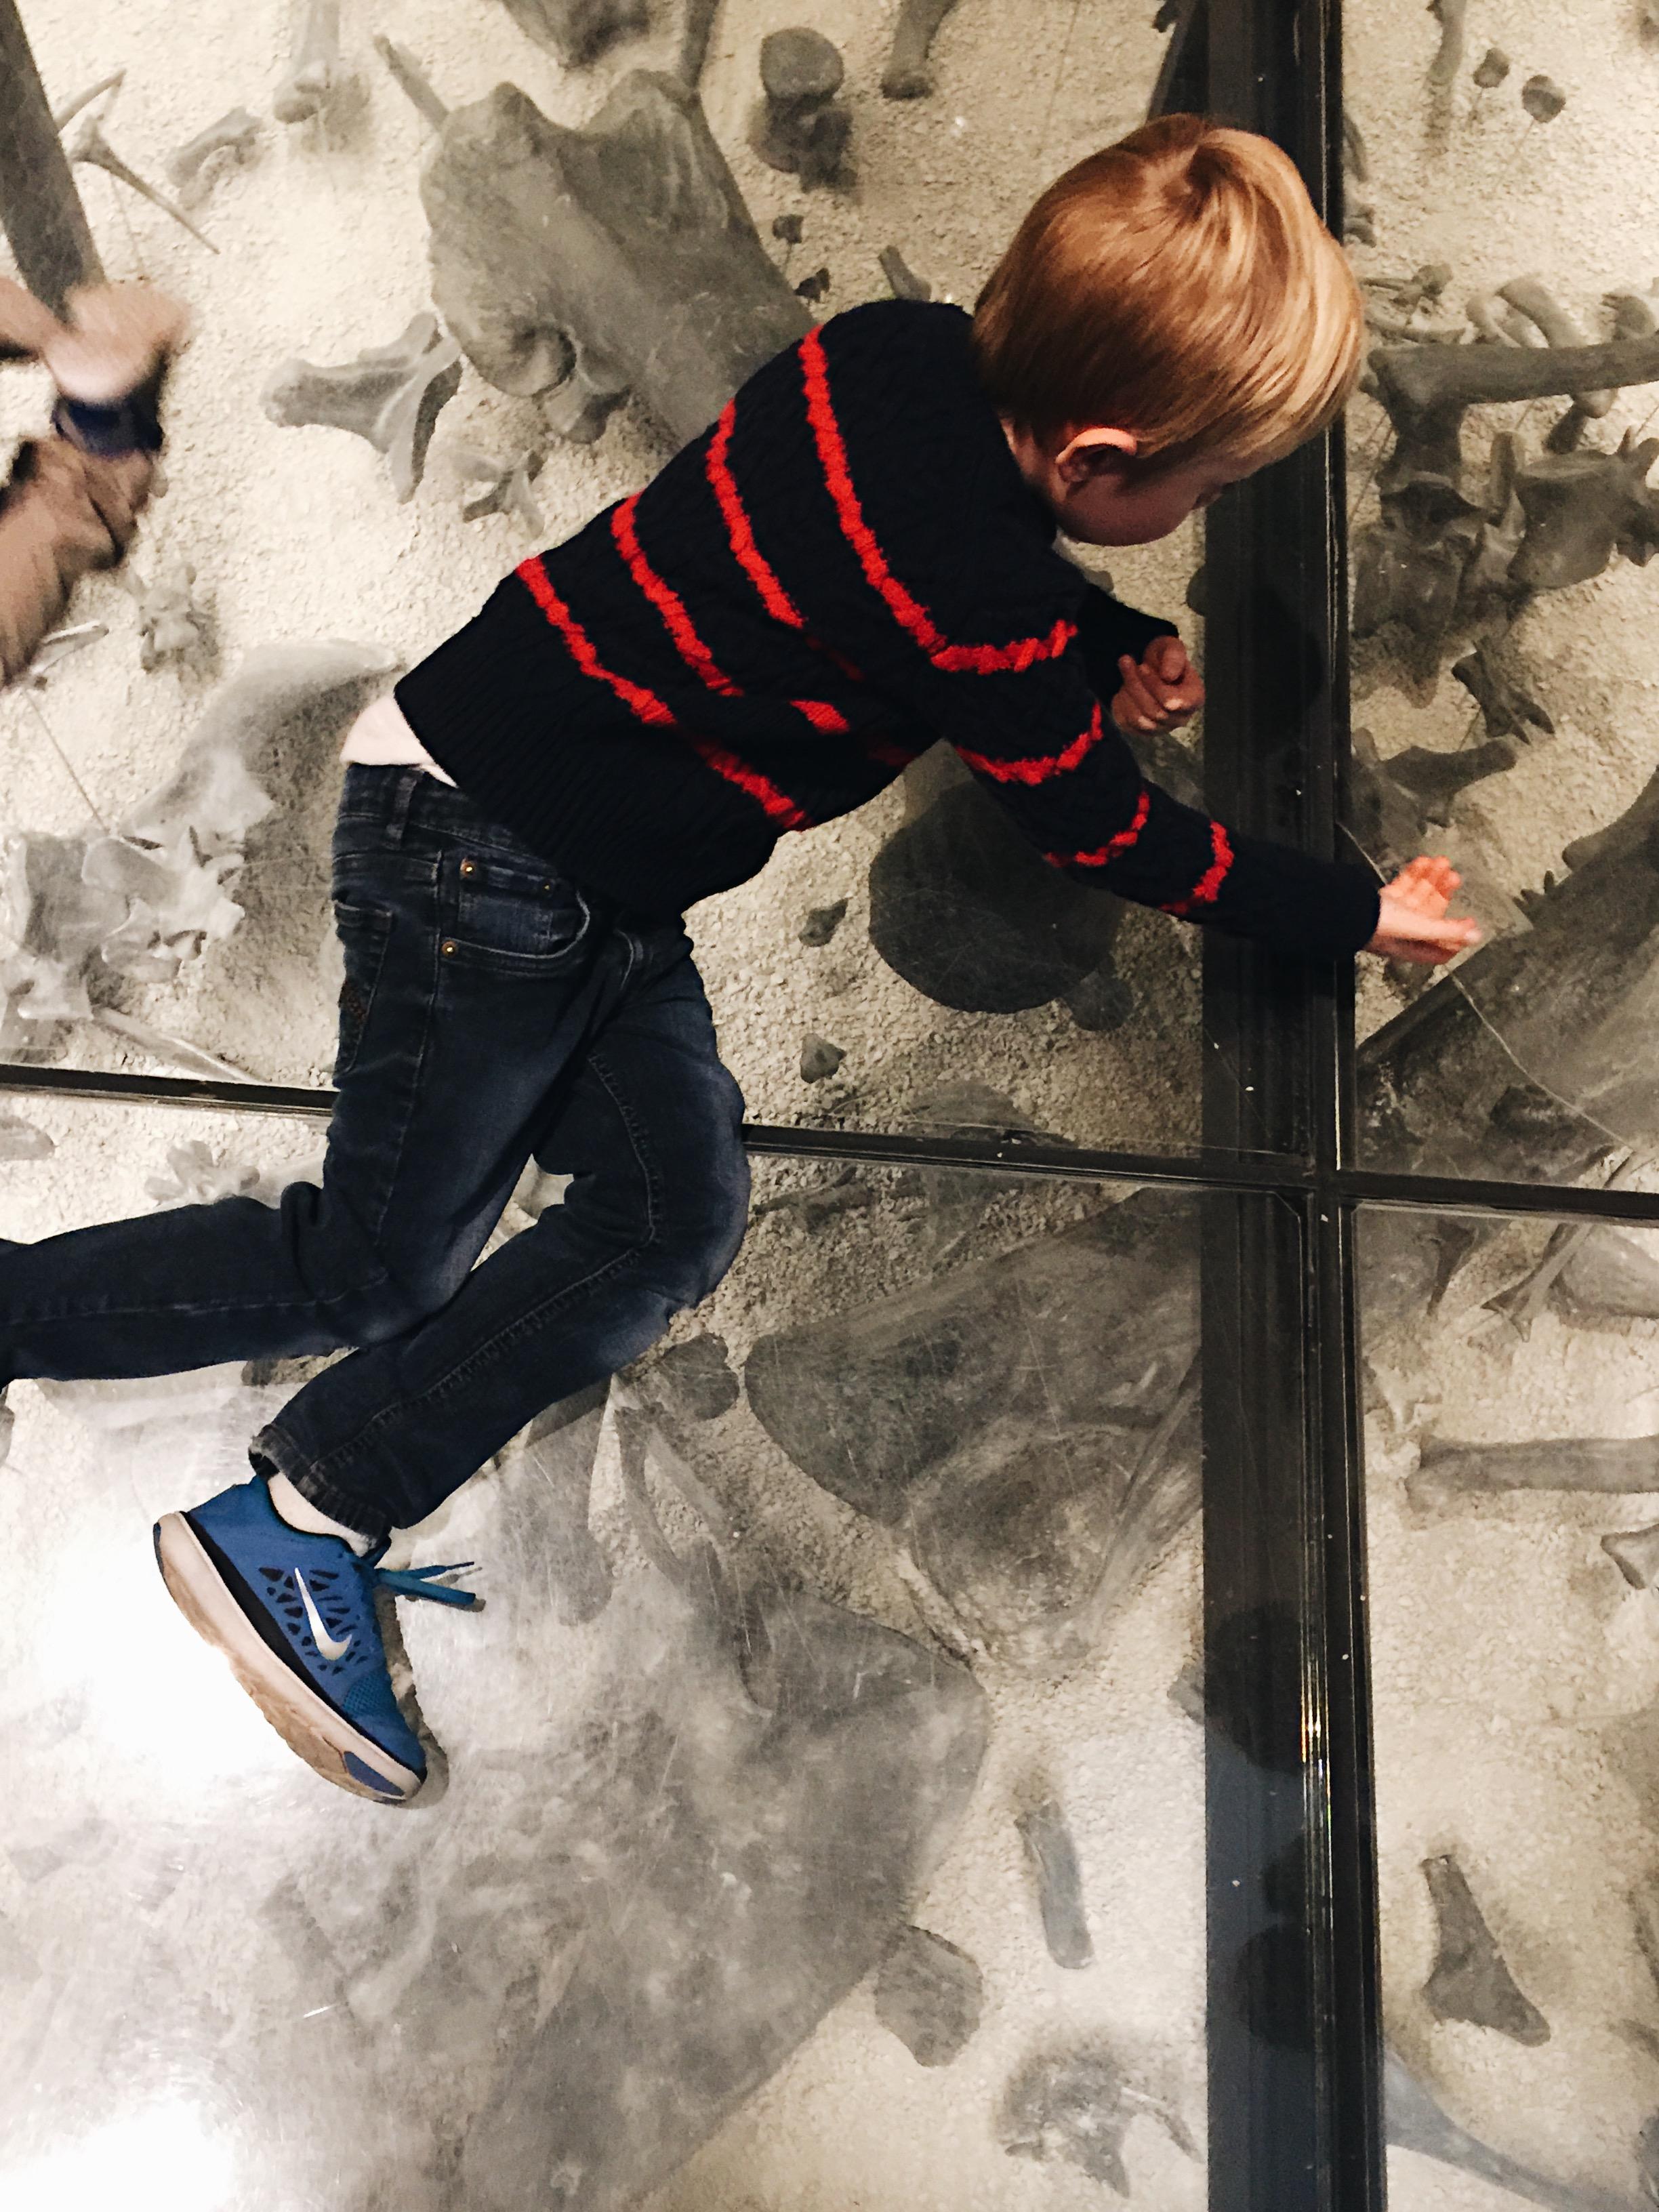 Coolest dinasaur dig that we could walk on!